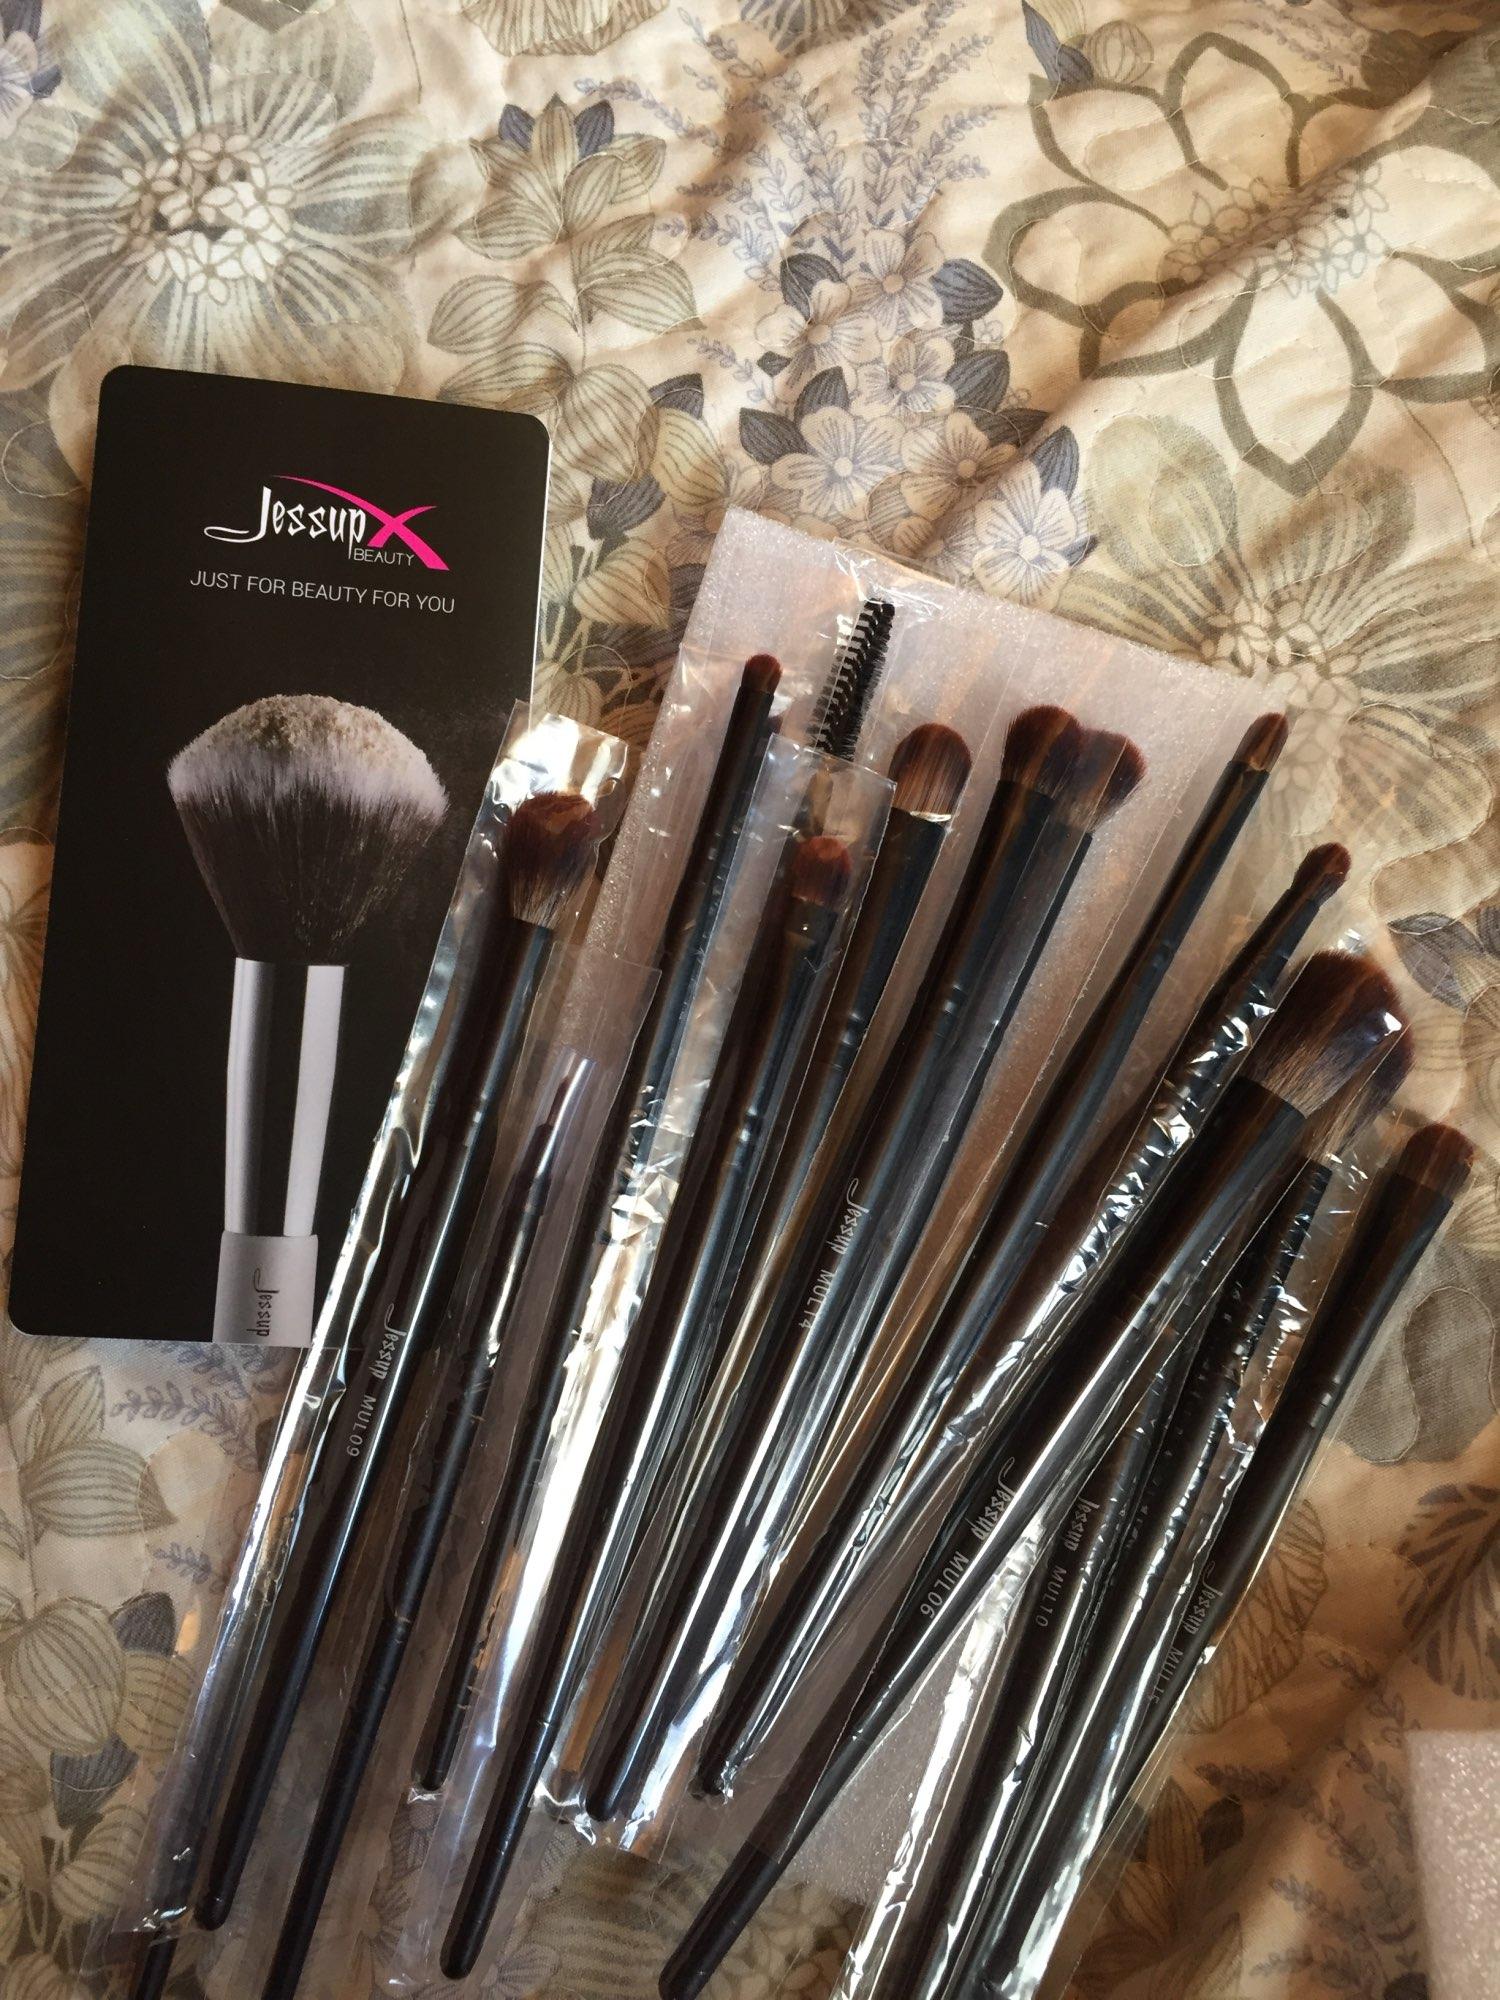 Jessup New Arrival Makeup brushes brushes Phantom Black 3-21pcs Foundation brush Powder Concealer Eyeshadow Synthetic hair reviews №2 337682